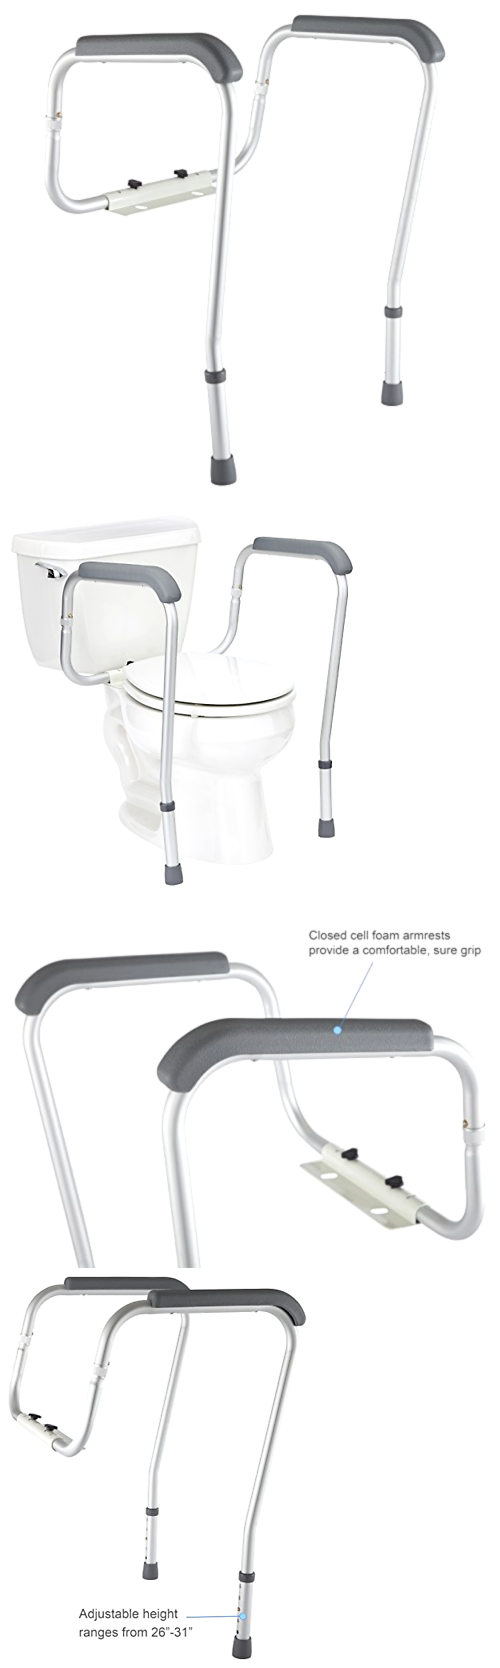 Handles and Rails: Grab Bars Adjustable Toilet Safety Rail ...